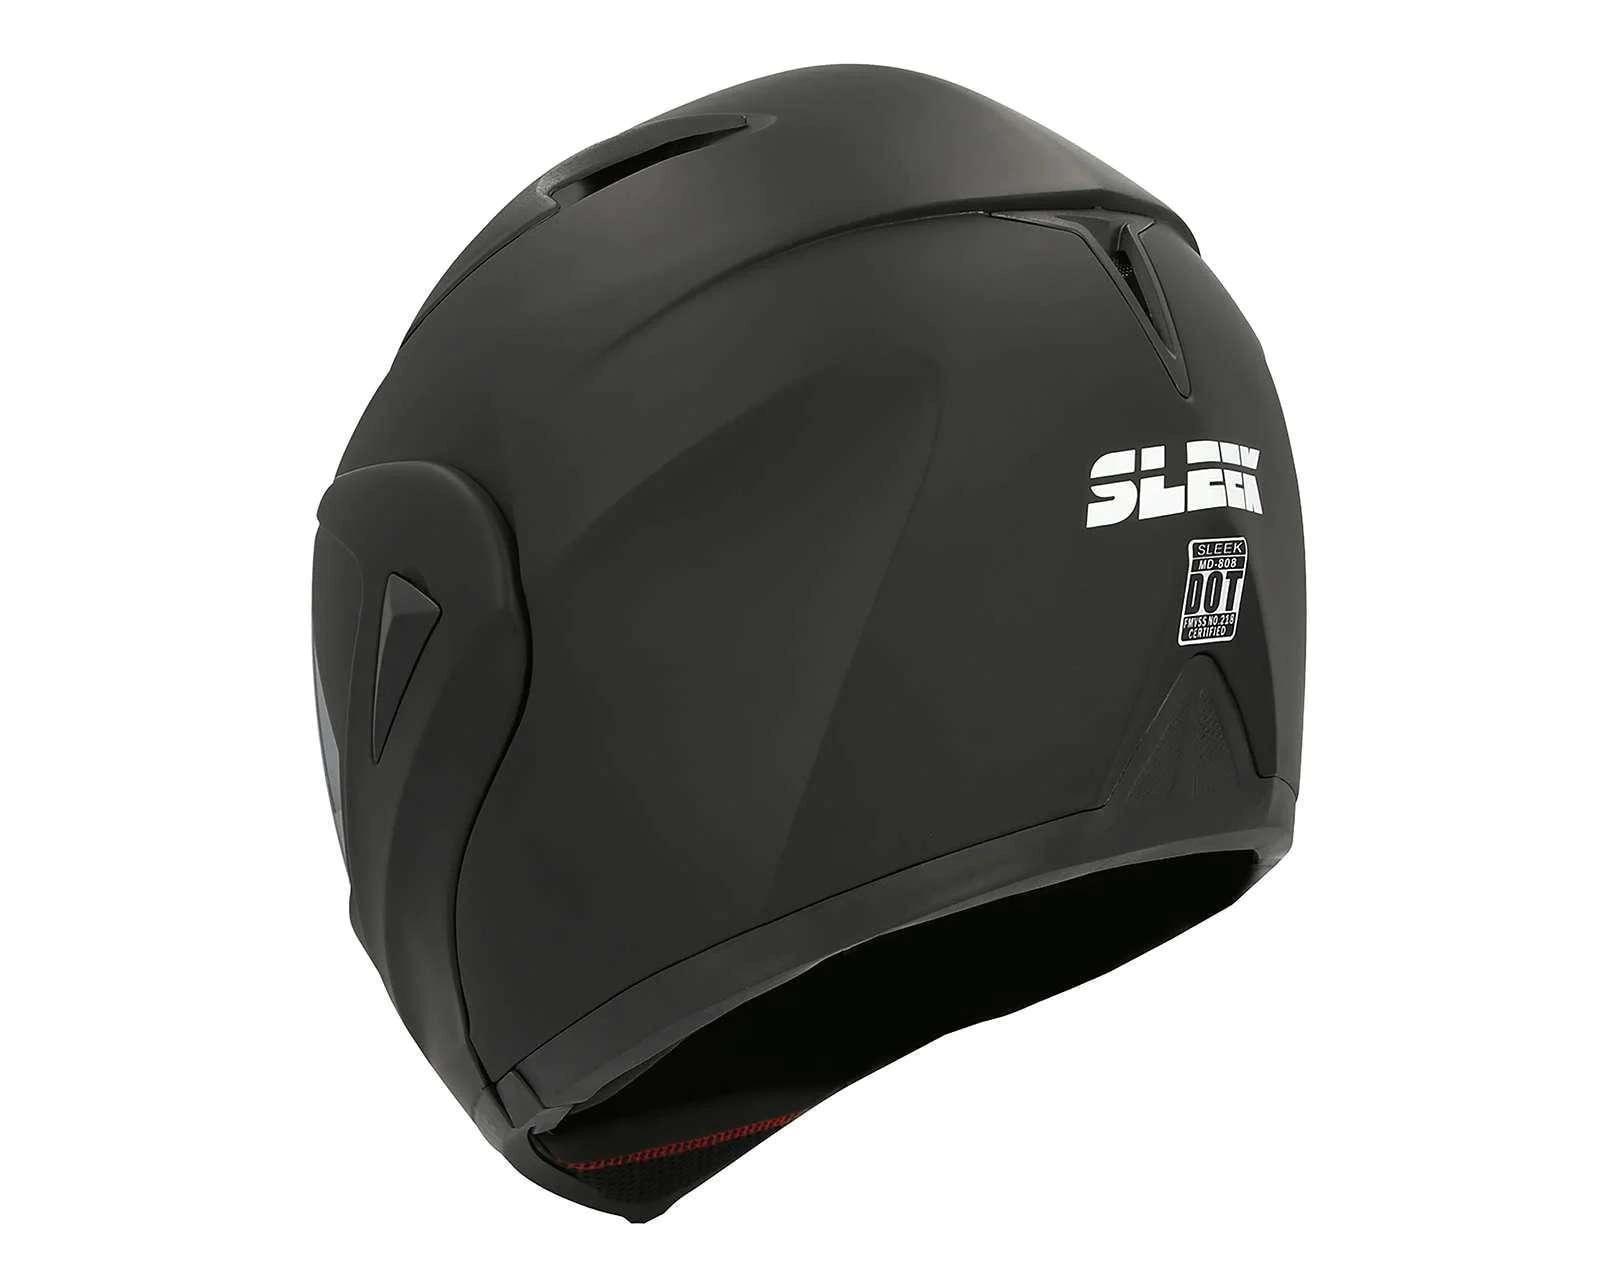 Foto 3 Casco para Motociclista Sleek Extragrande Doble Visor Negro